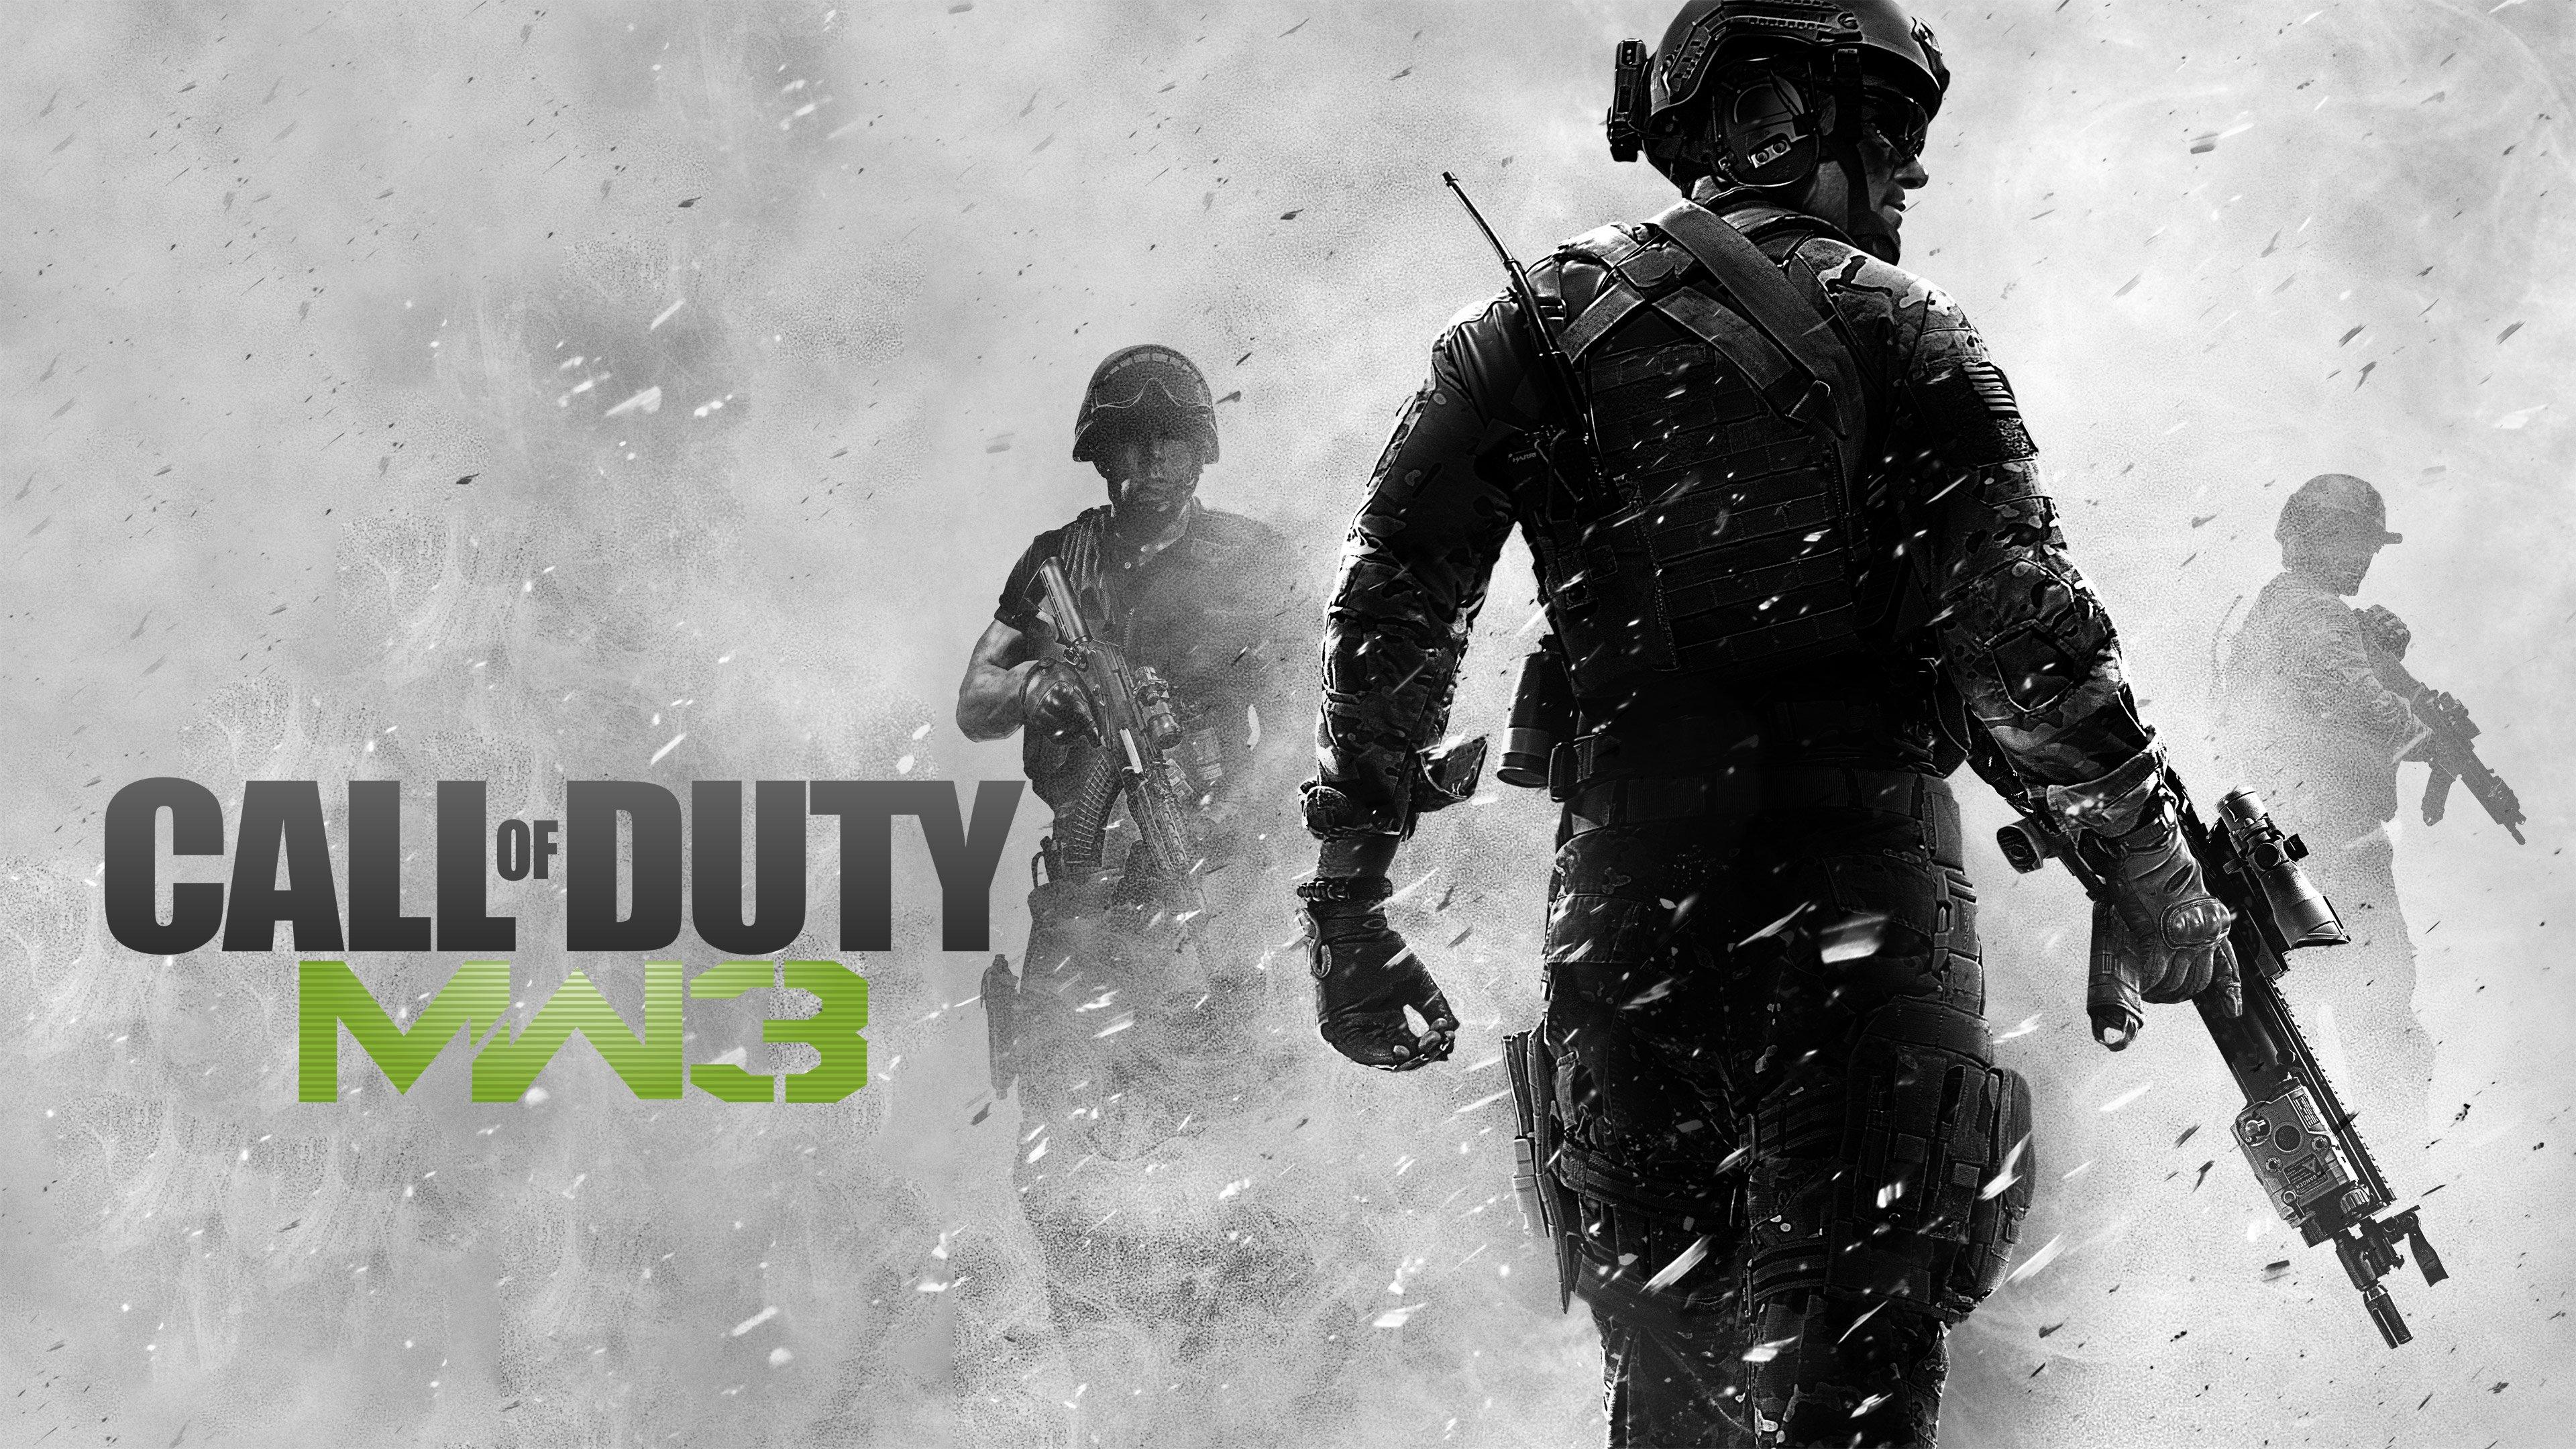 Call Of Duty Modern Warfare 3 Free Download Gametrex